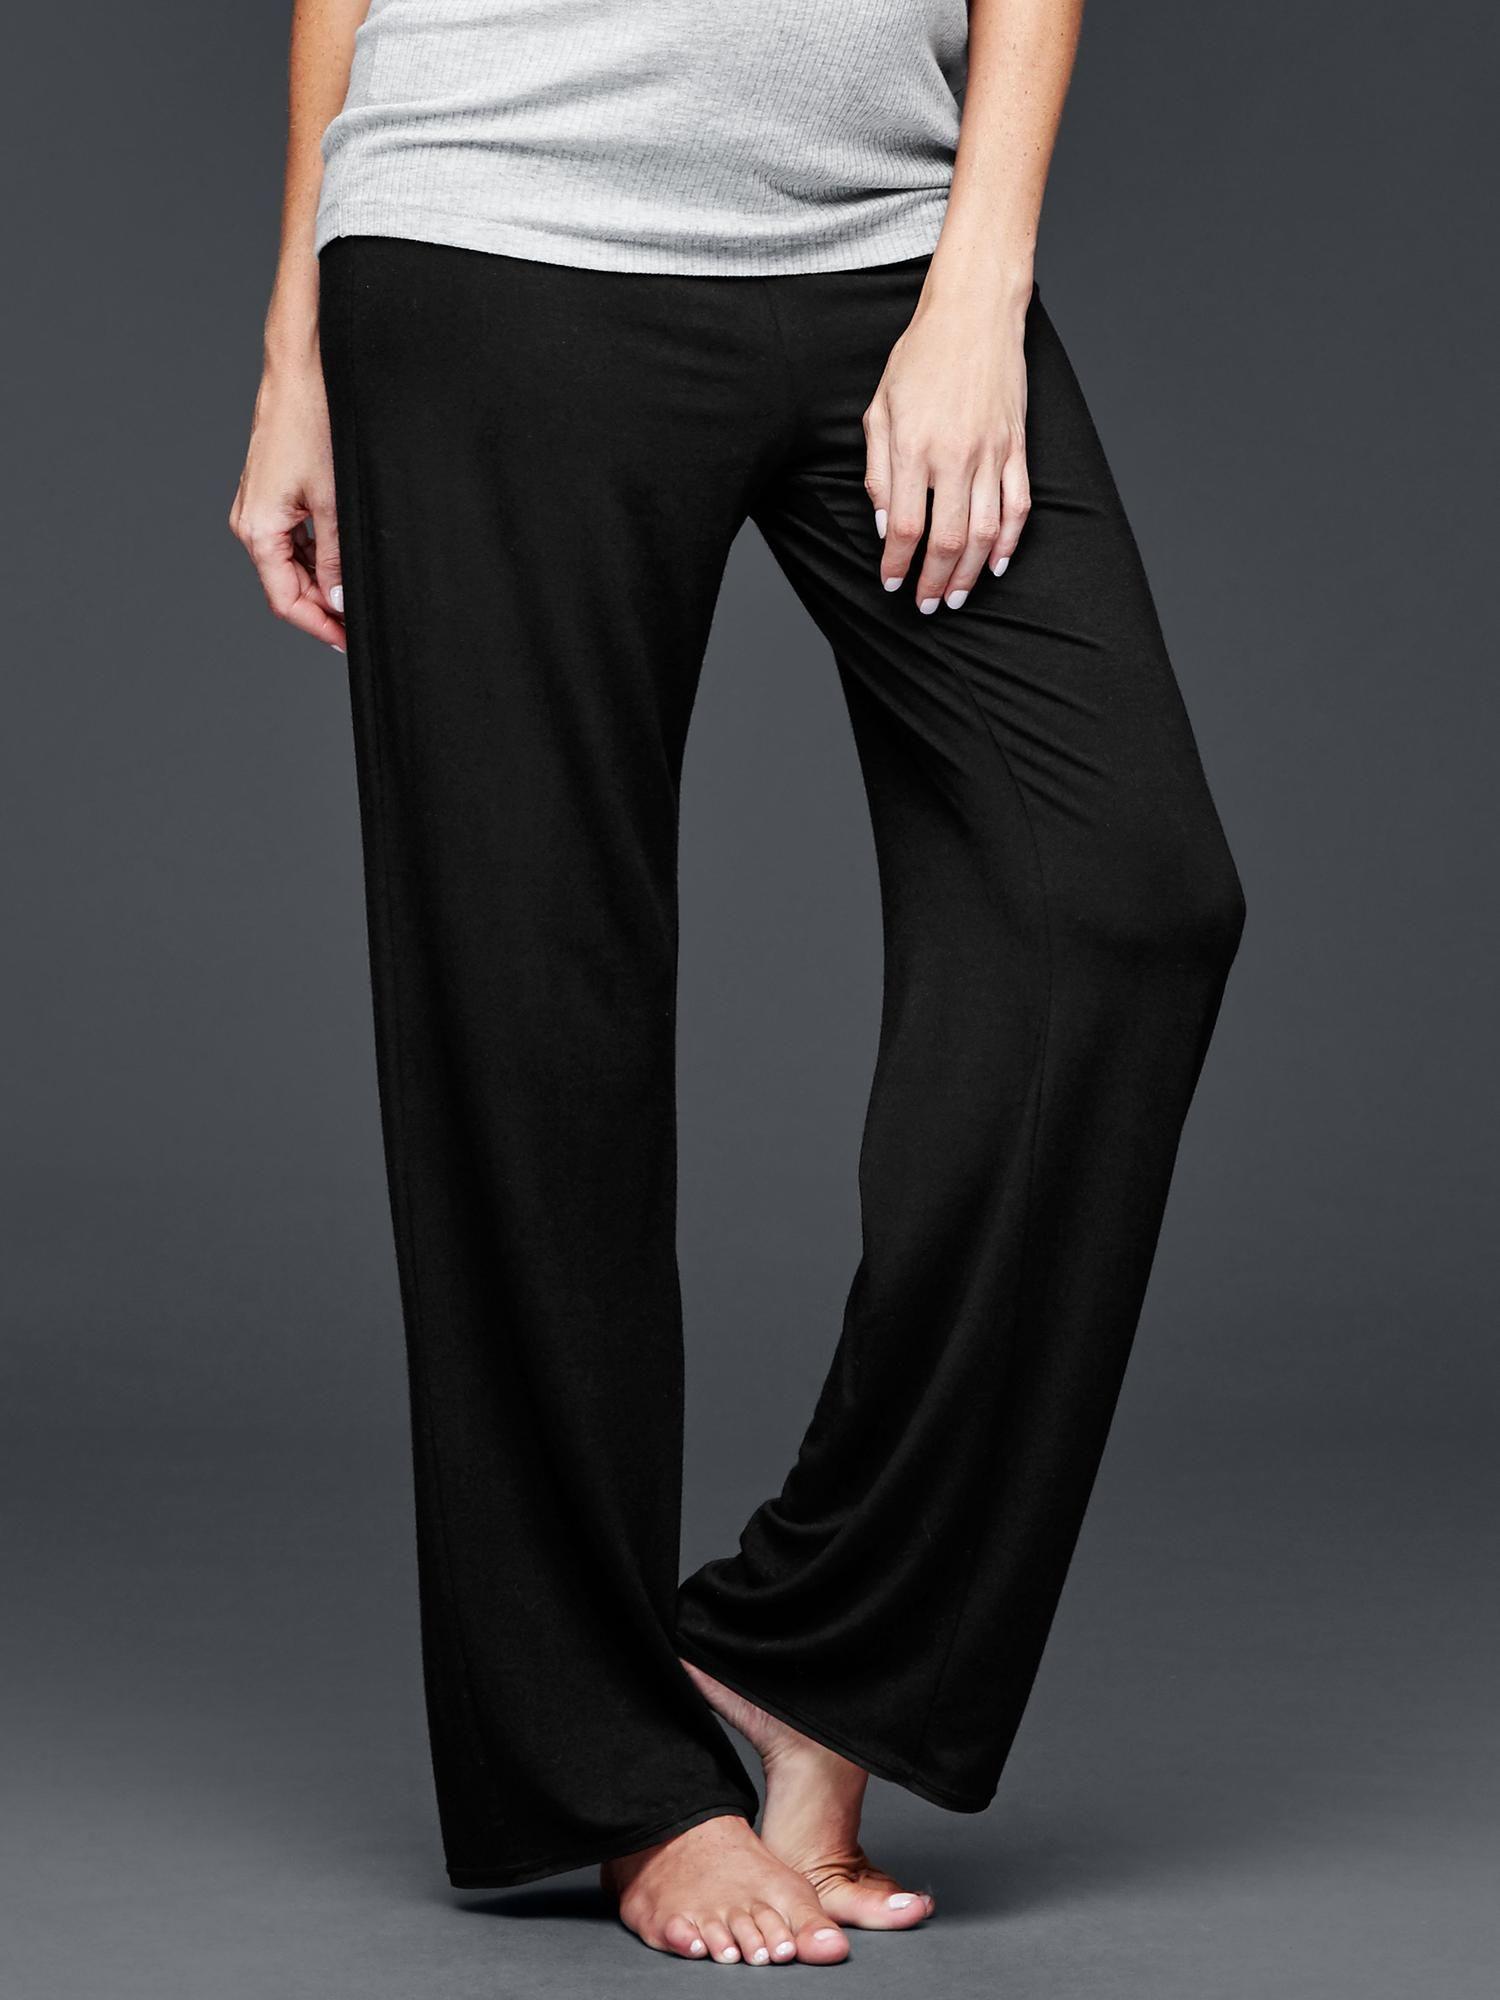 xcvi comforter clothing stylish c comfortable p s wear by pants womens movement ashland athleisure and women fqqiyug